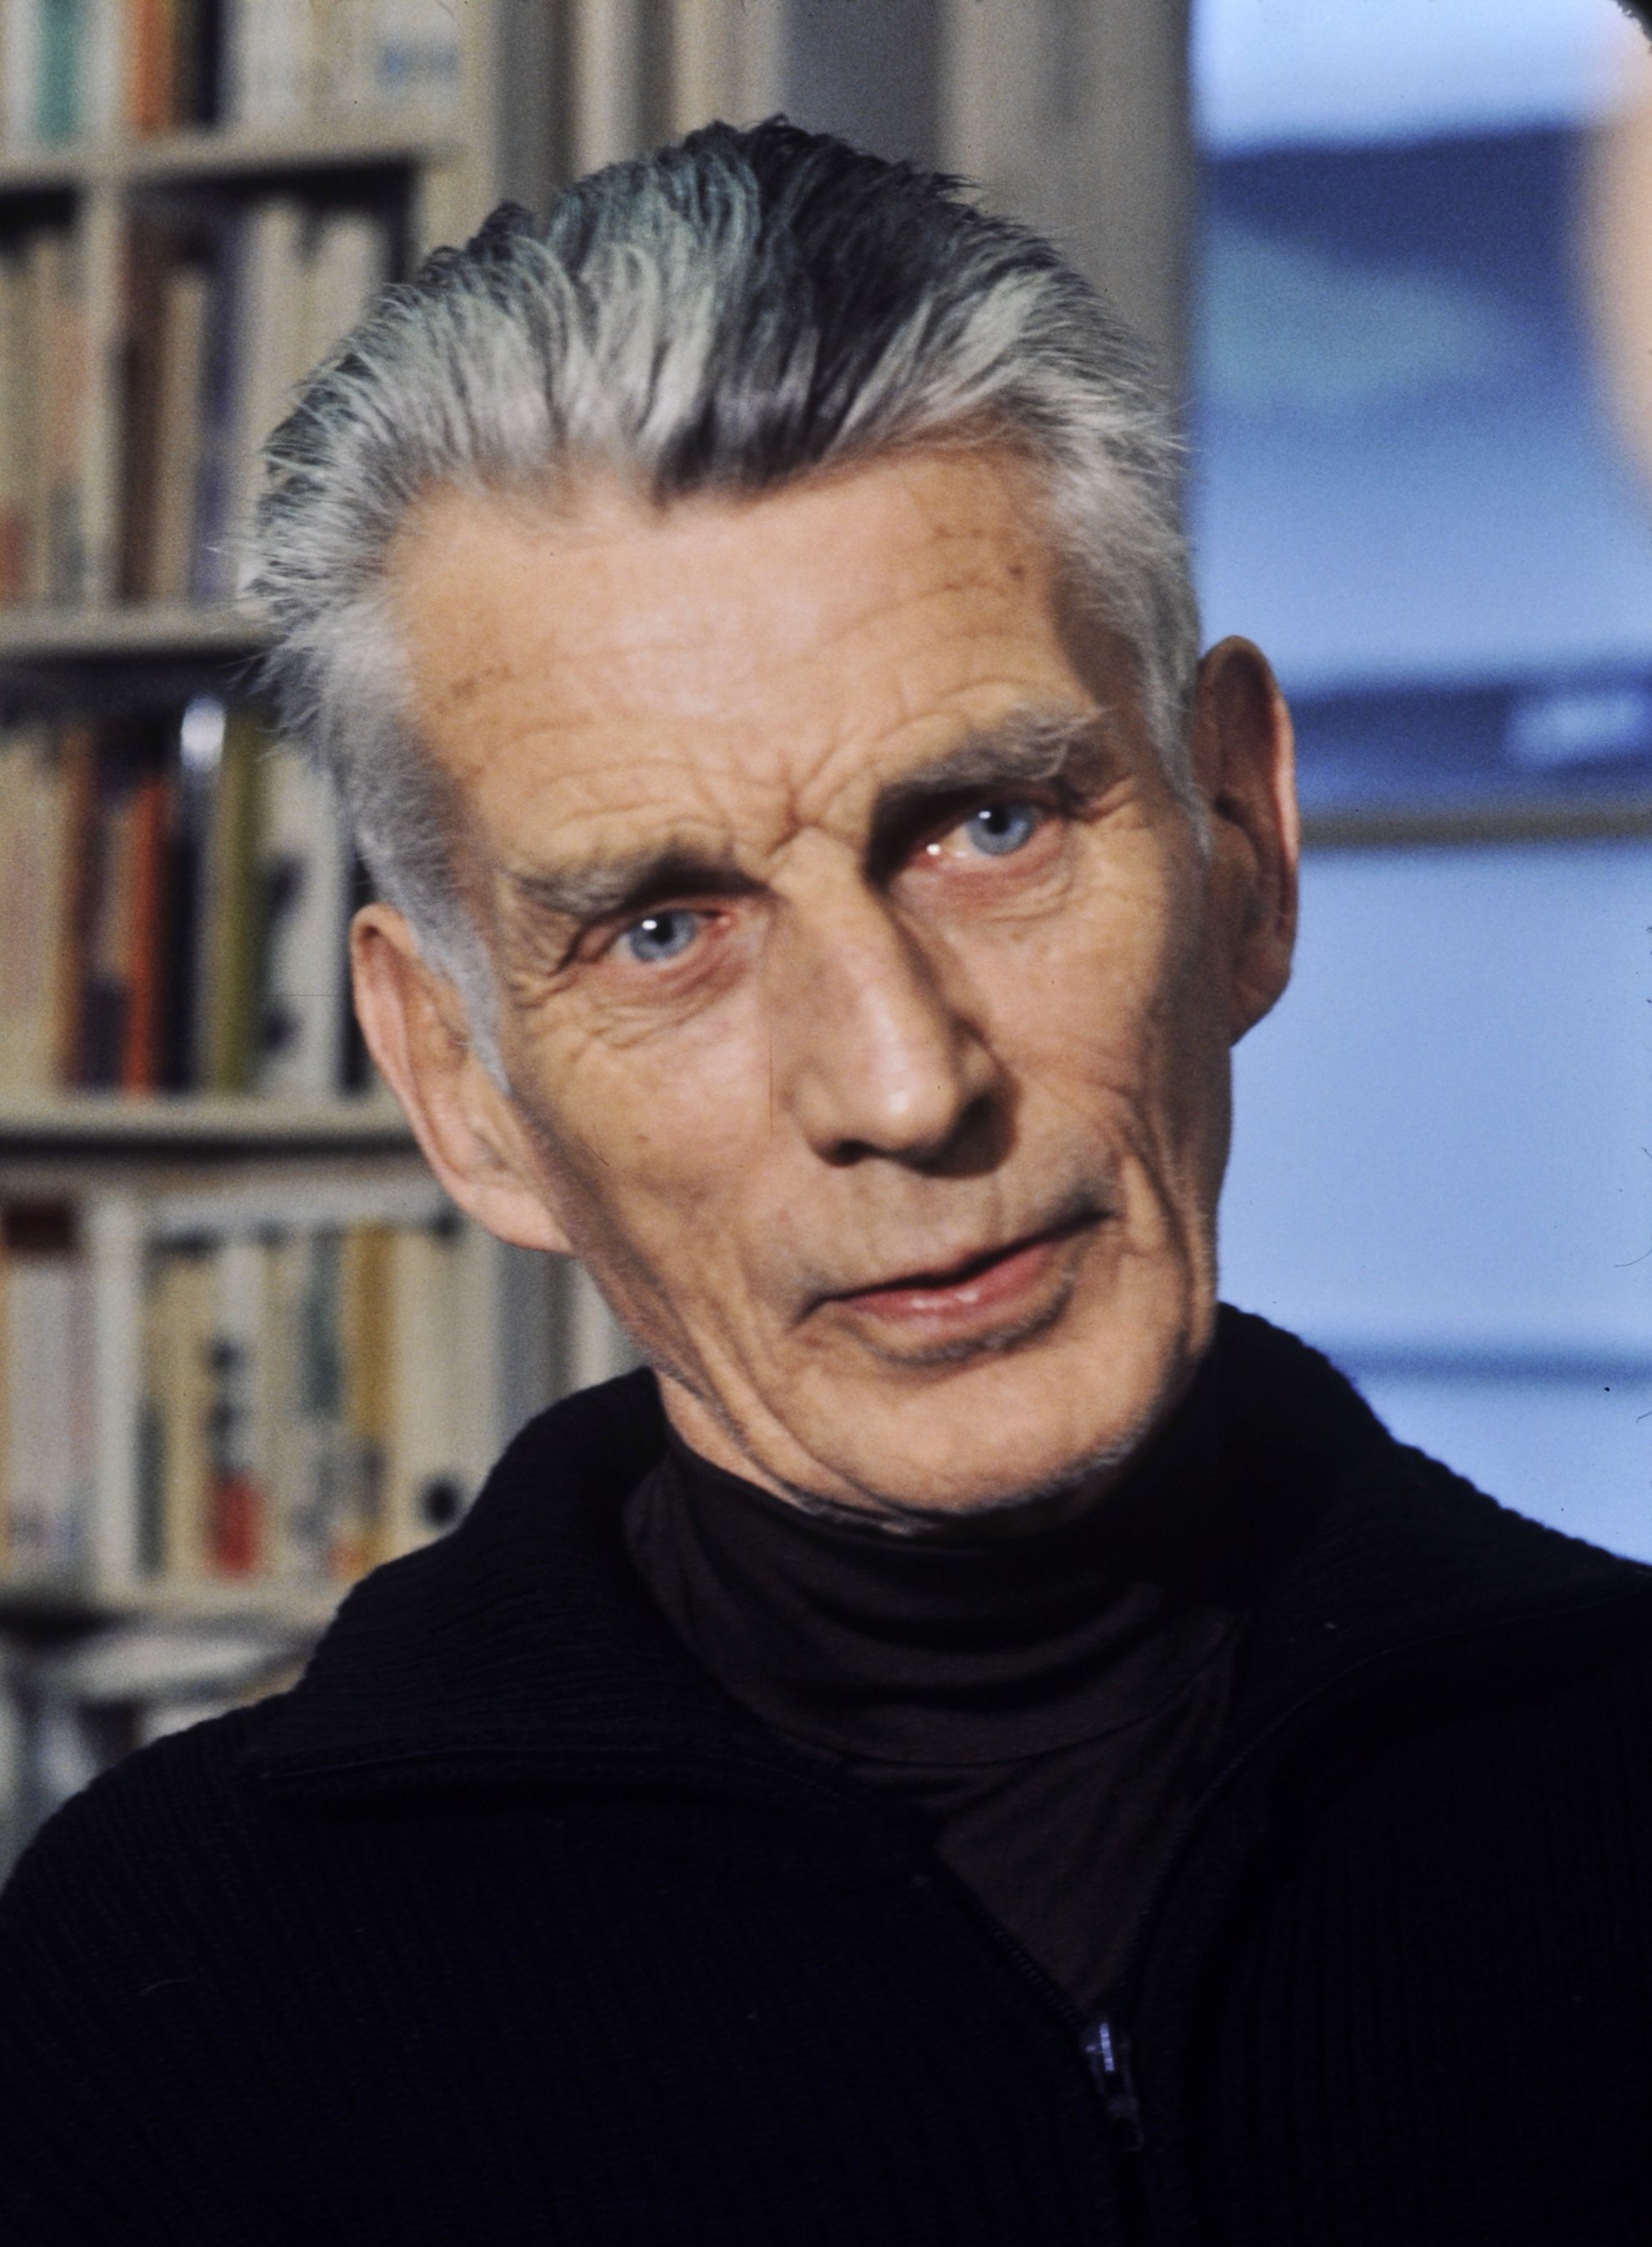 Beckett in 1977